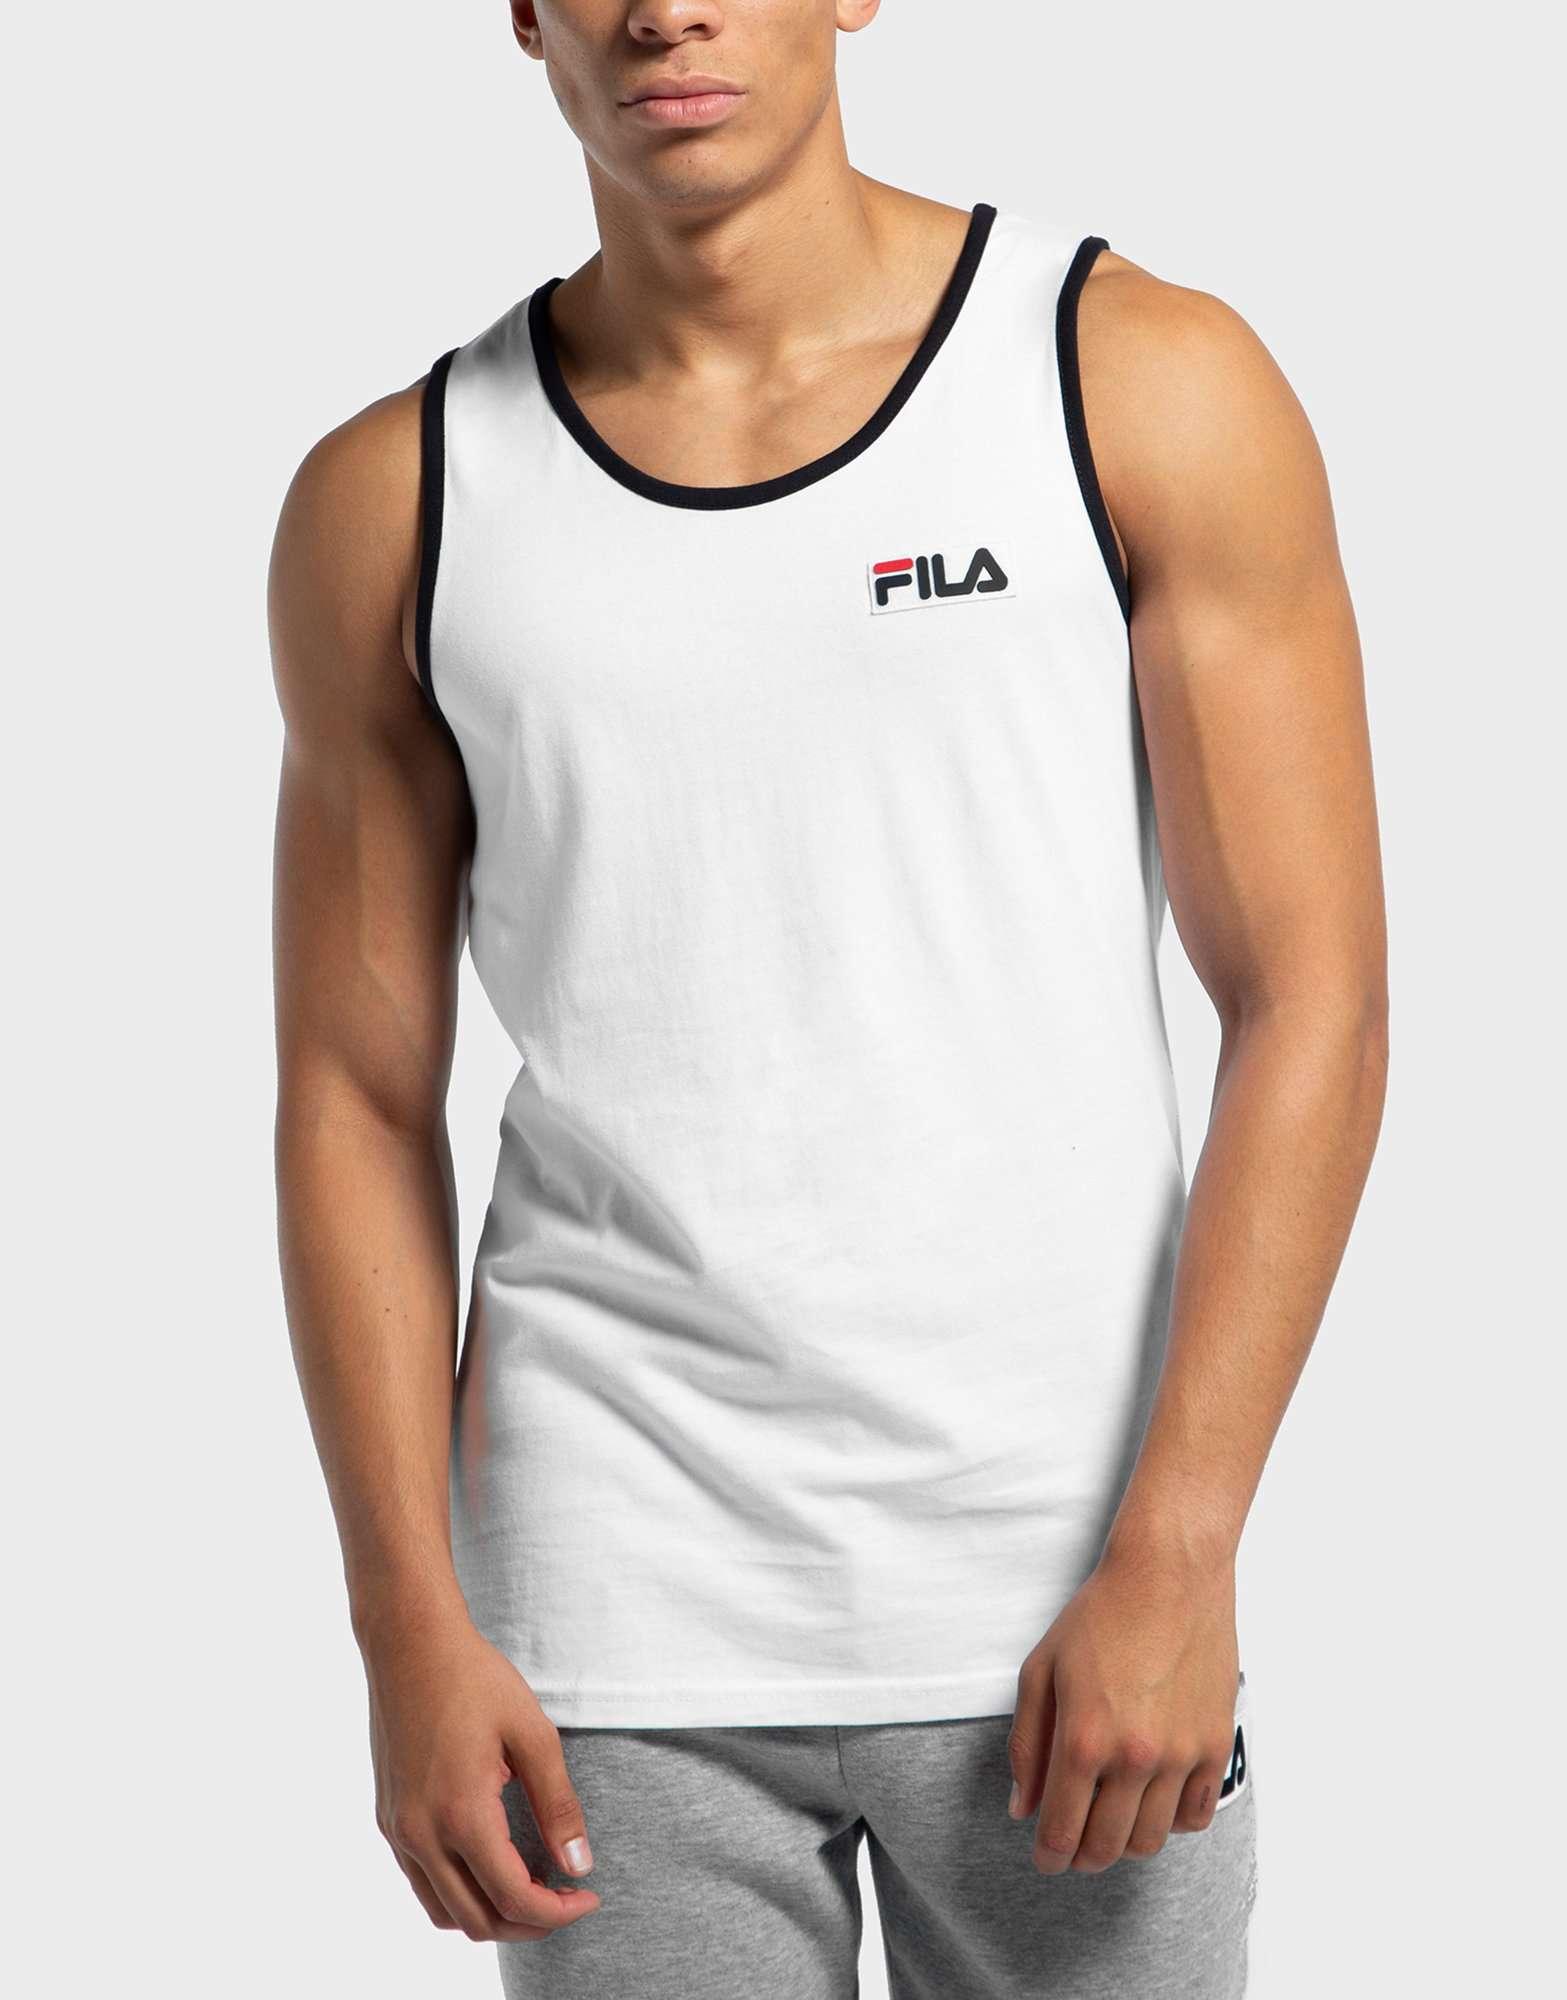 Fila Jiunco Vest - Exclusive